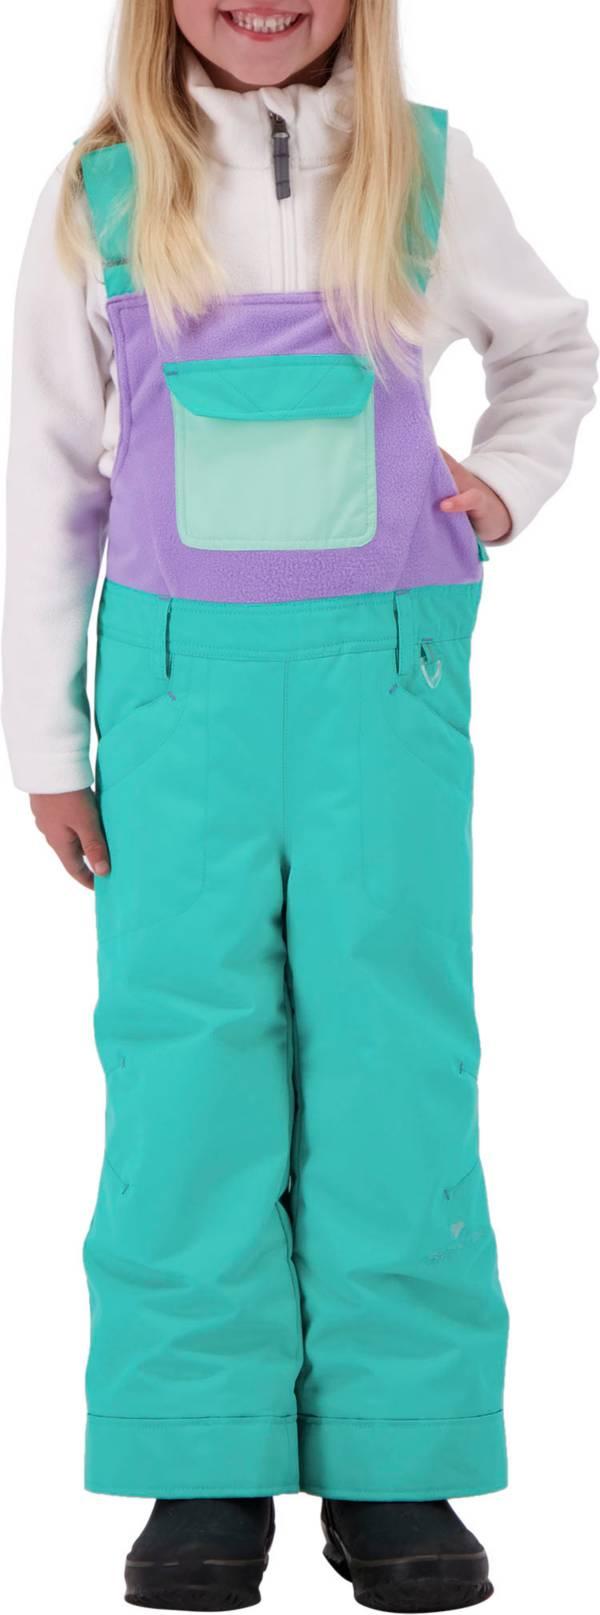 Obermeyer Girls' Disco Snow Bib product image